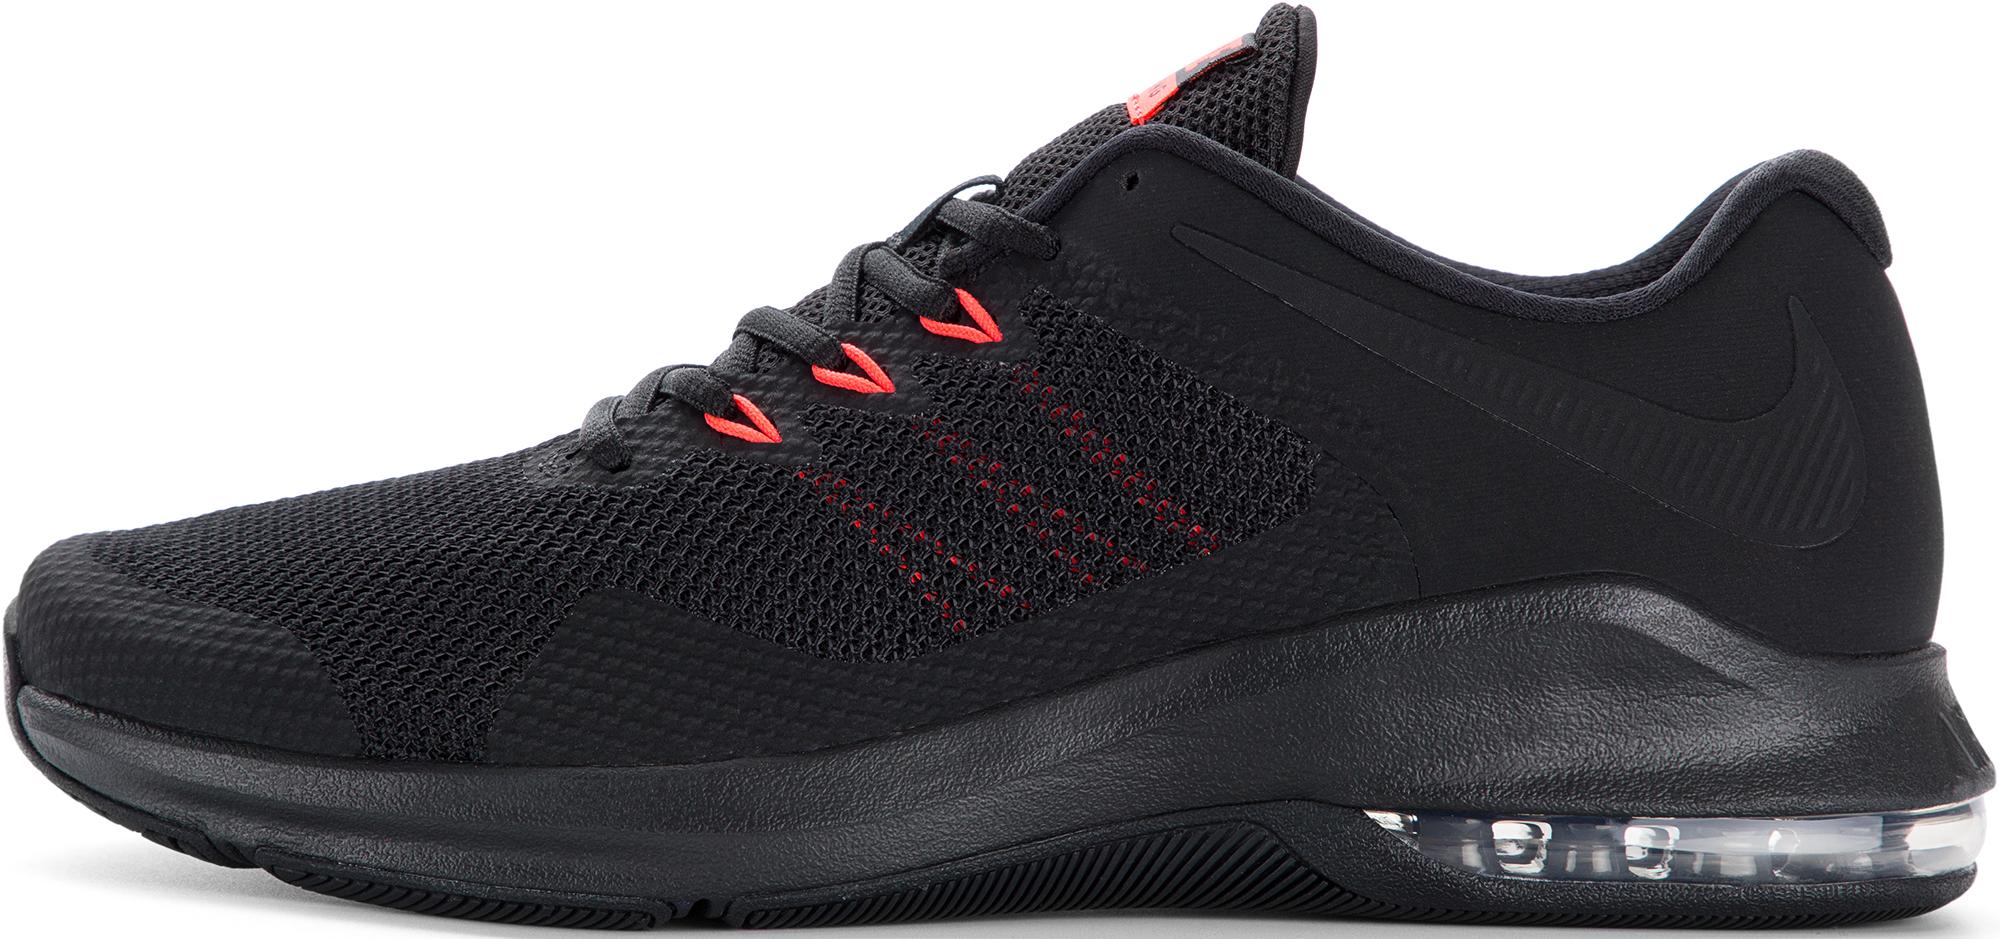 Nike Кроссовки мужские Nike Air Max Alpha Trainer, размер 45